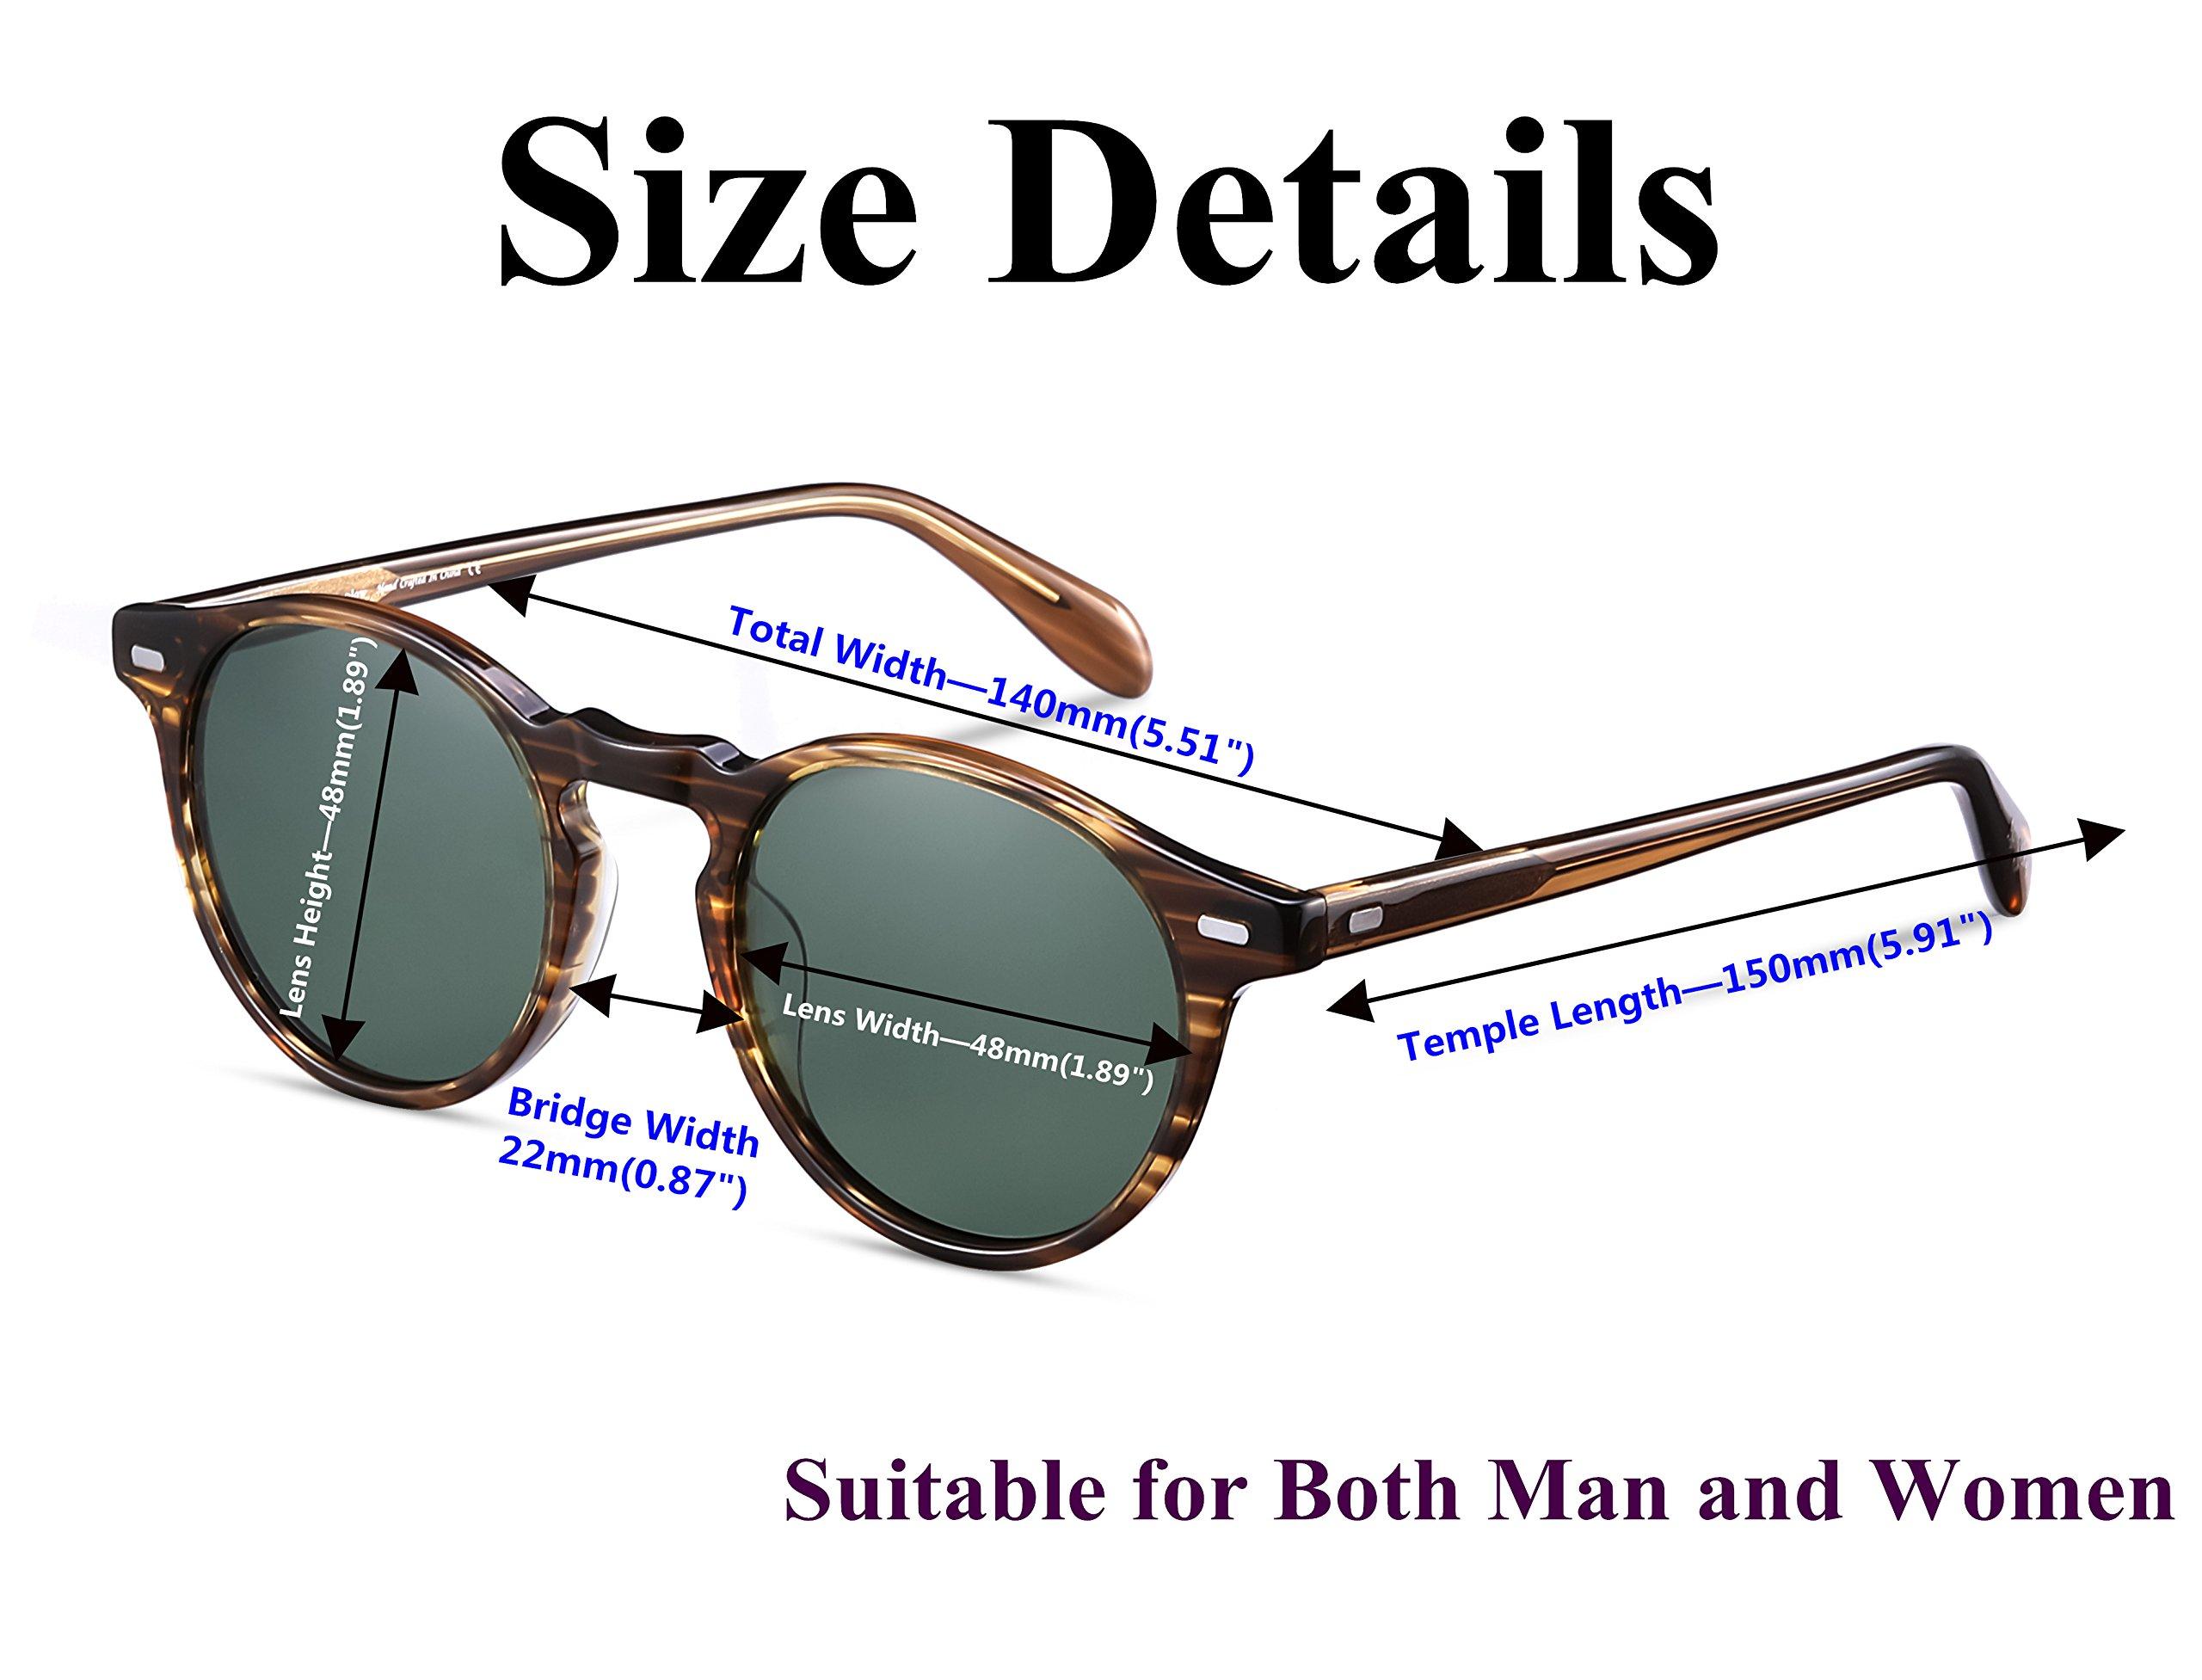 EyeGlow Vintage Round Sunglasses Women Sunglasses Men Polarized Lens 5187 Acetate material (Blonde vs green polarized lens, As pictures) by EyeGlow (Image #4)